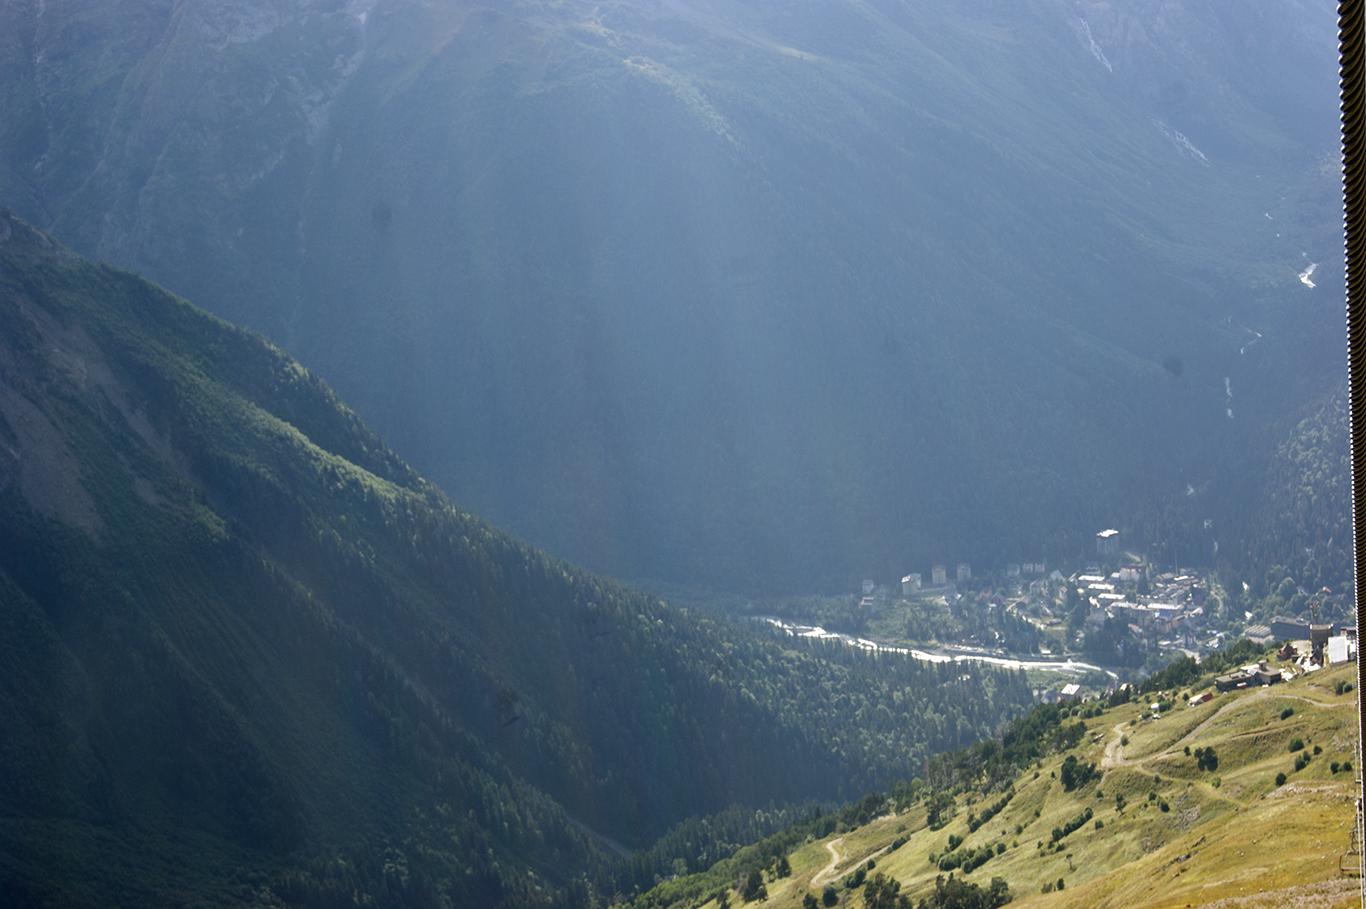 Долина Домбай видна как на ладони.